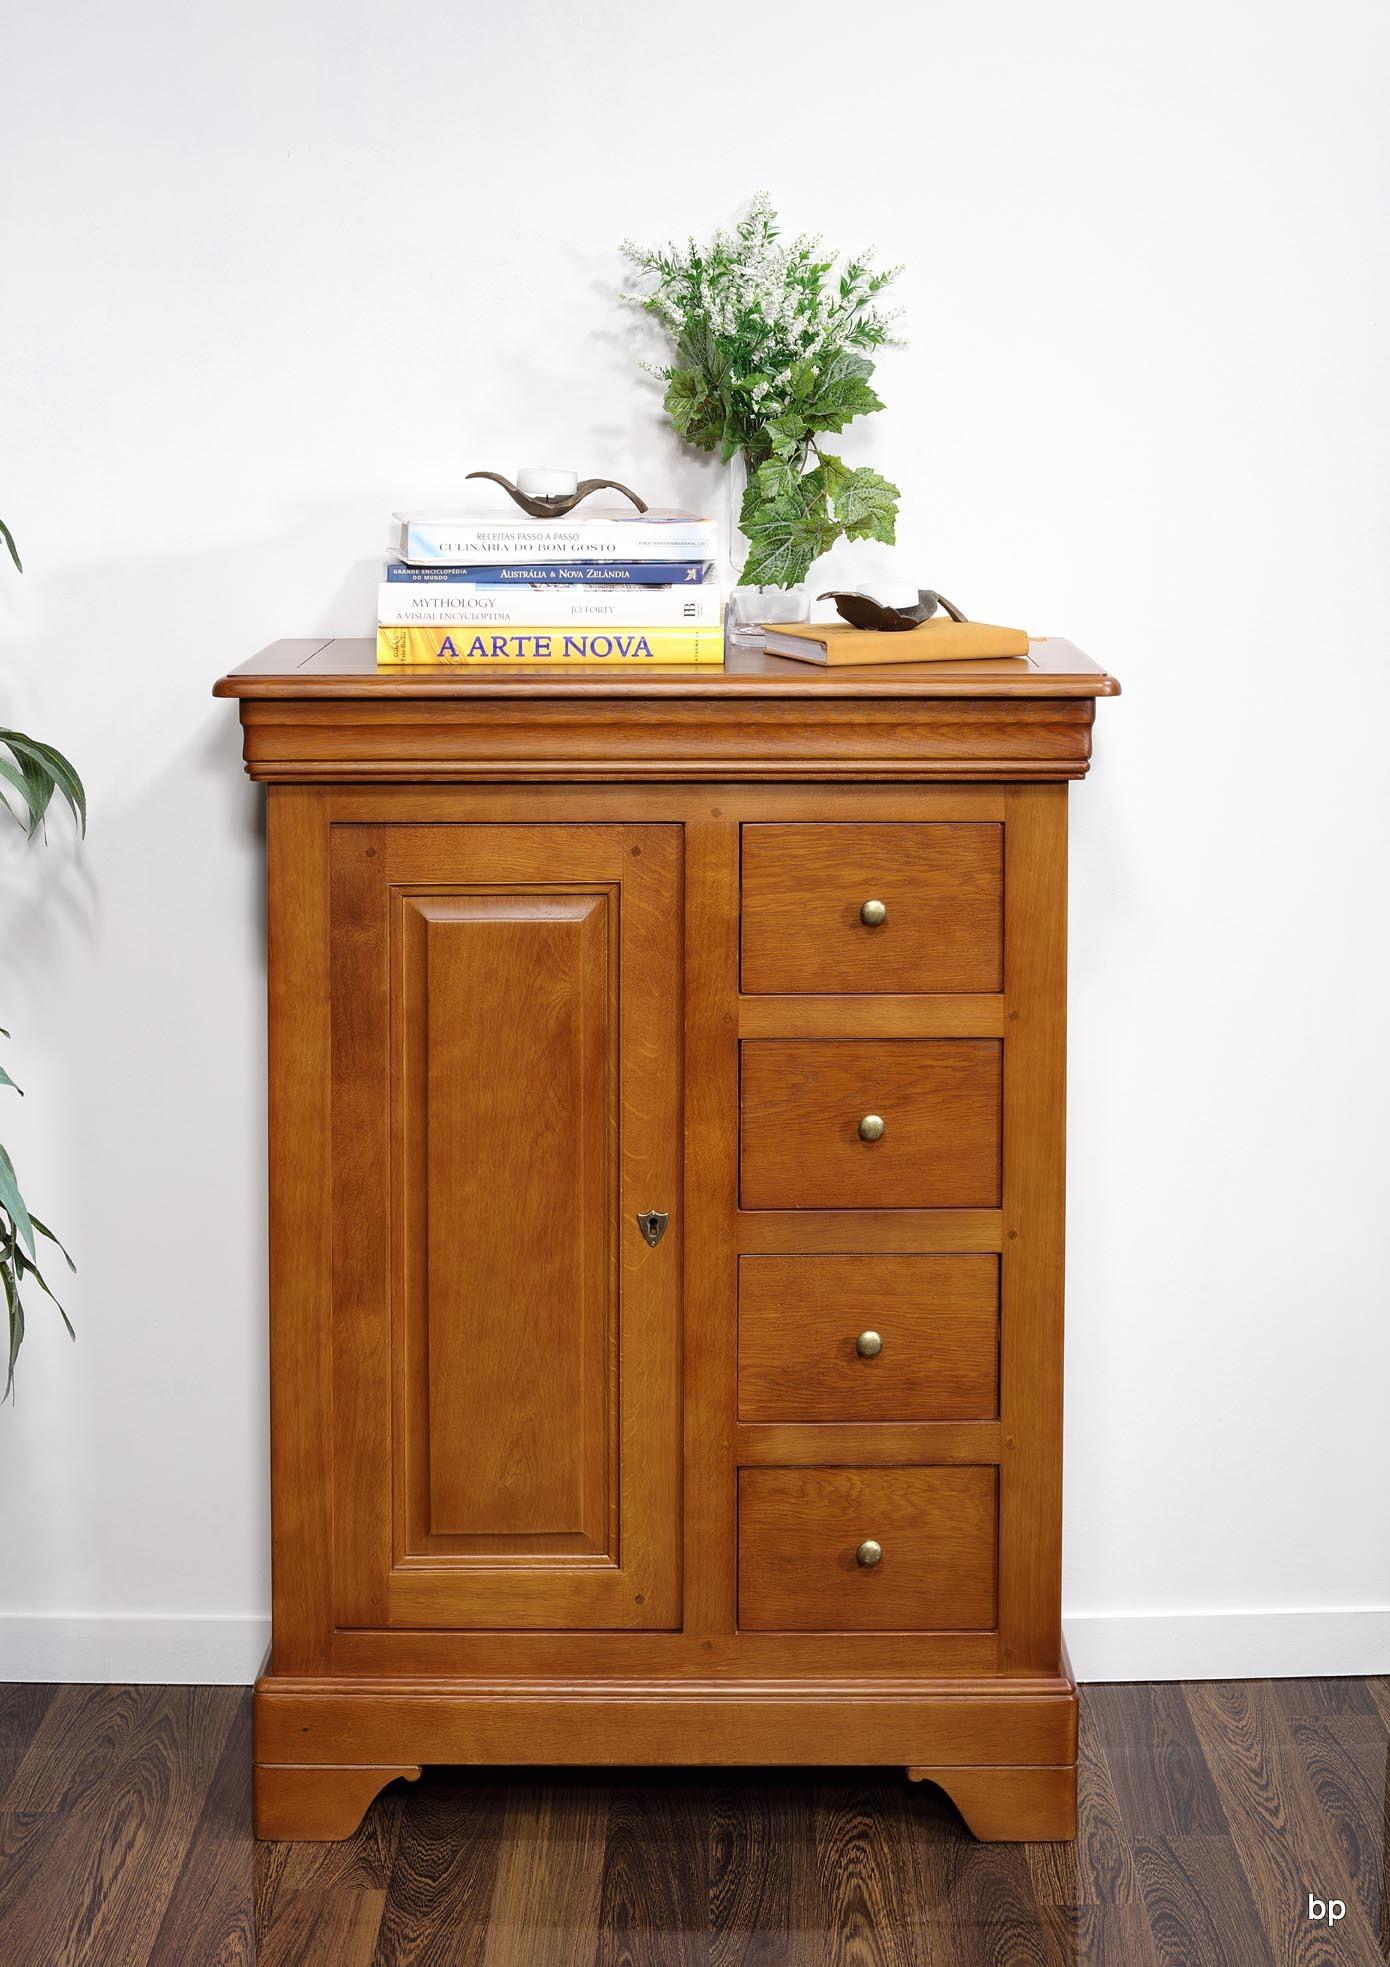 farinier 1 porte 5 tiroirs jean en ch ne massif de style louis philippe finition ch ne moyen. Black Bedroom Furniture Sets. Home Design Ideas